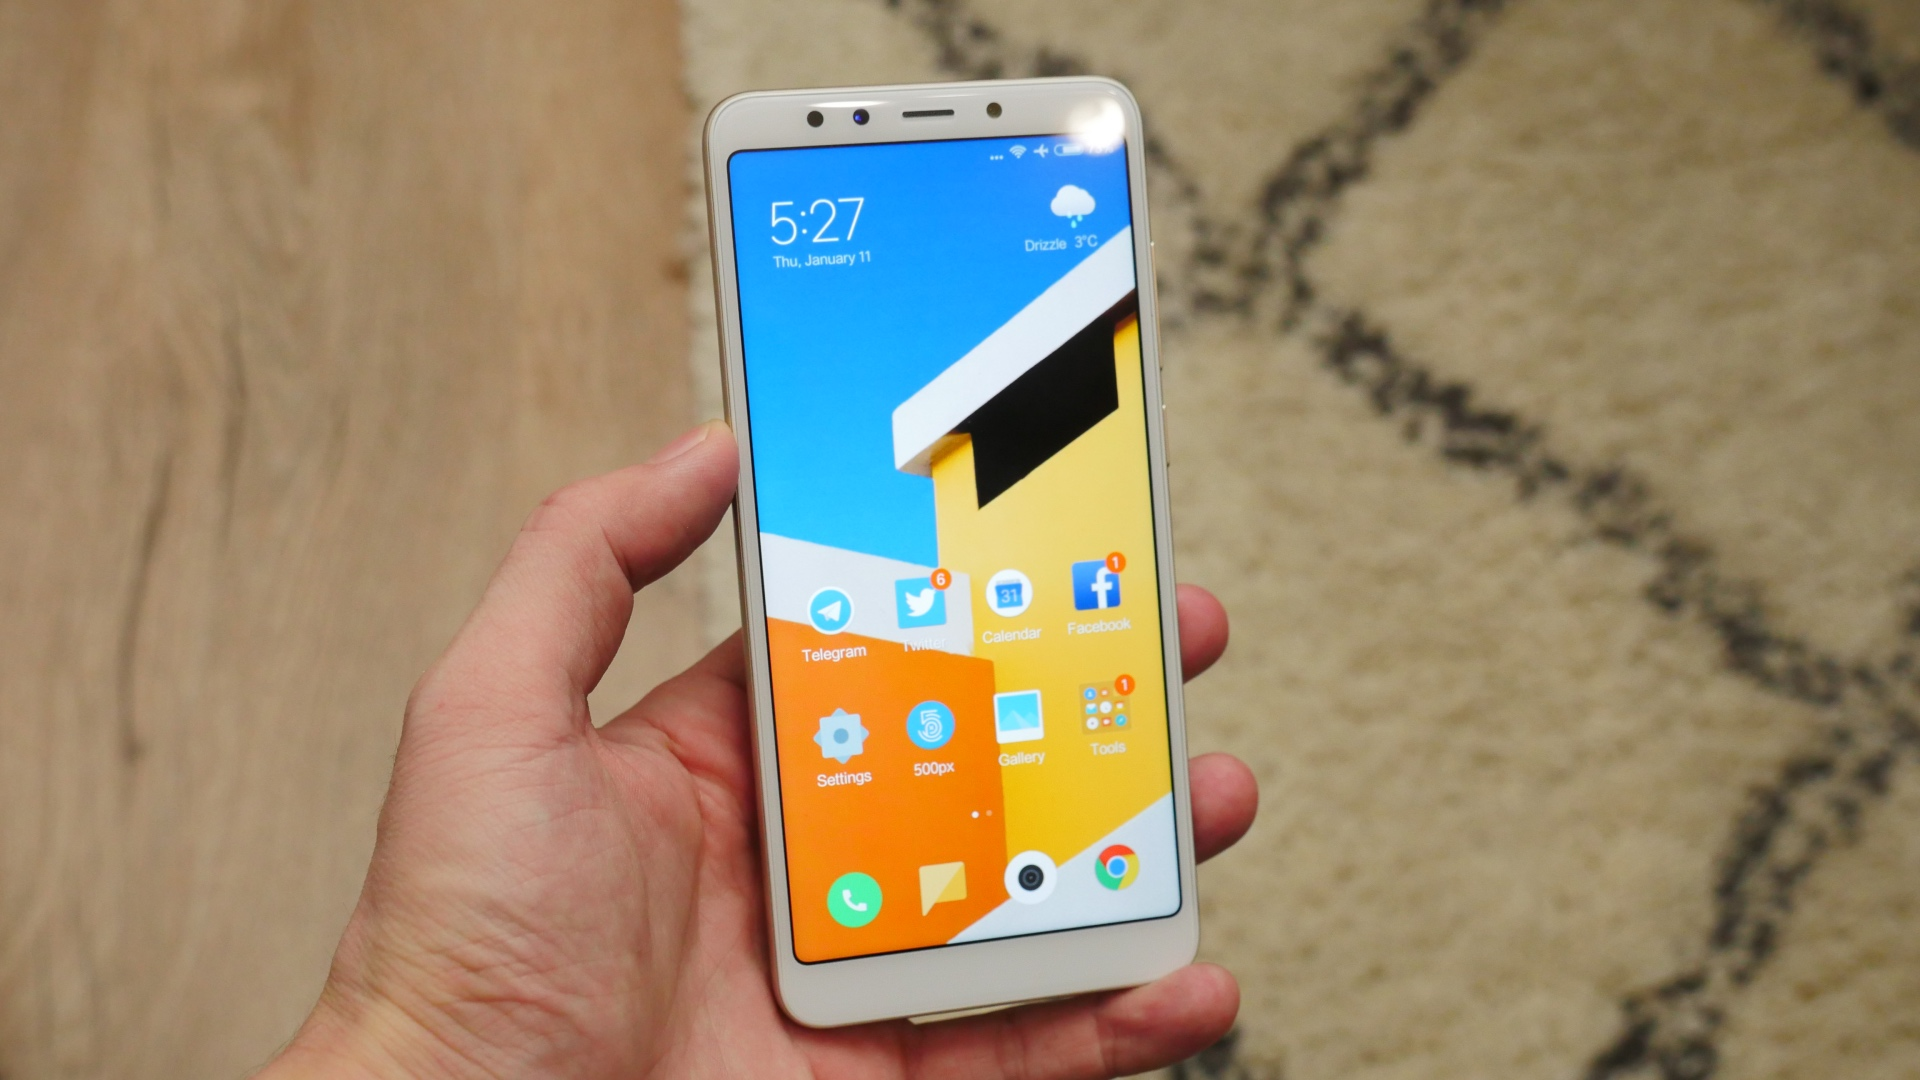 Xiaomi redmi 5 звонит сам по себе - Решение проблемы